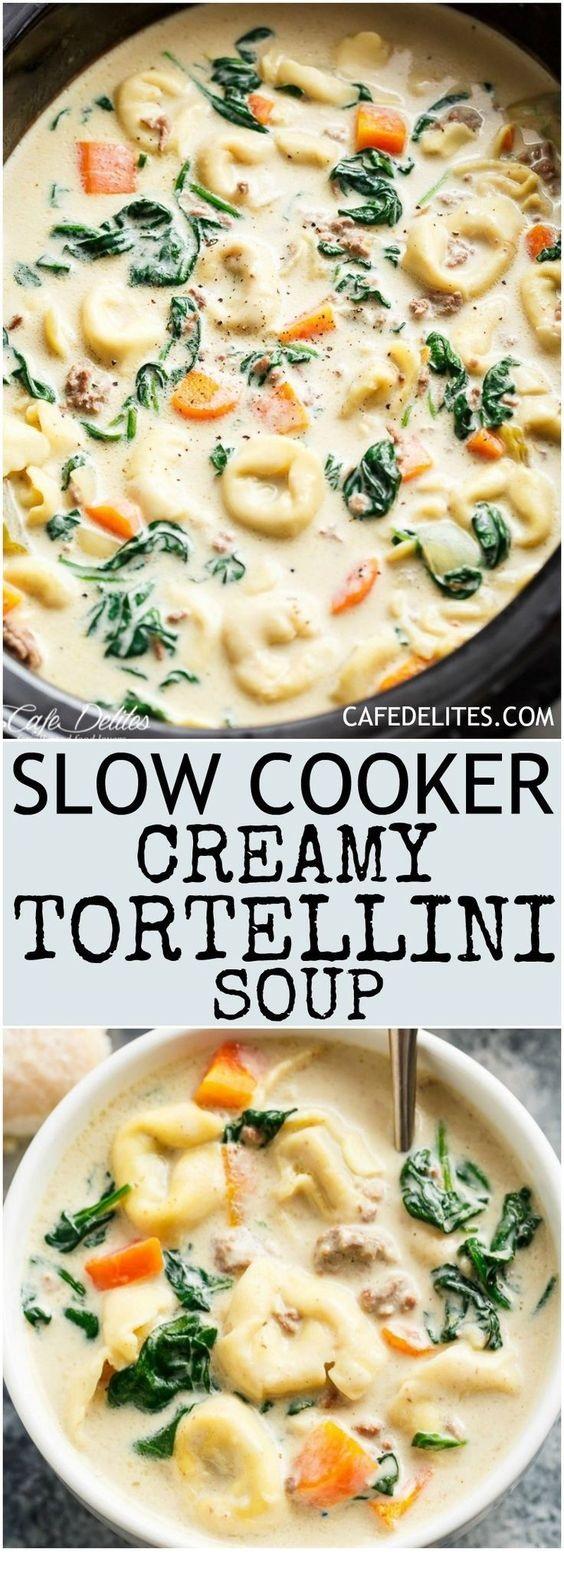 Slow Cooker Creamy Tortellini Soup